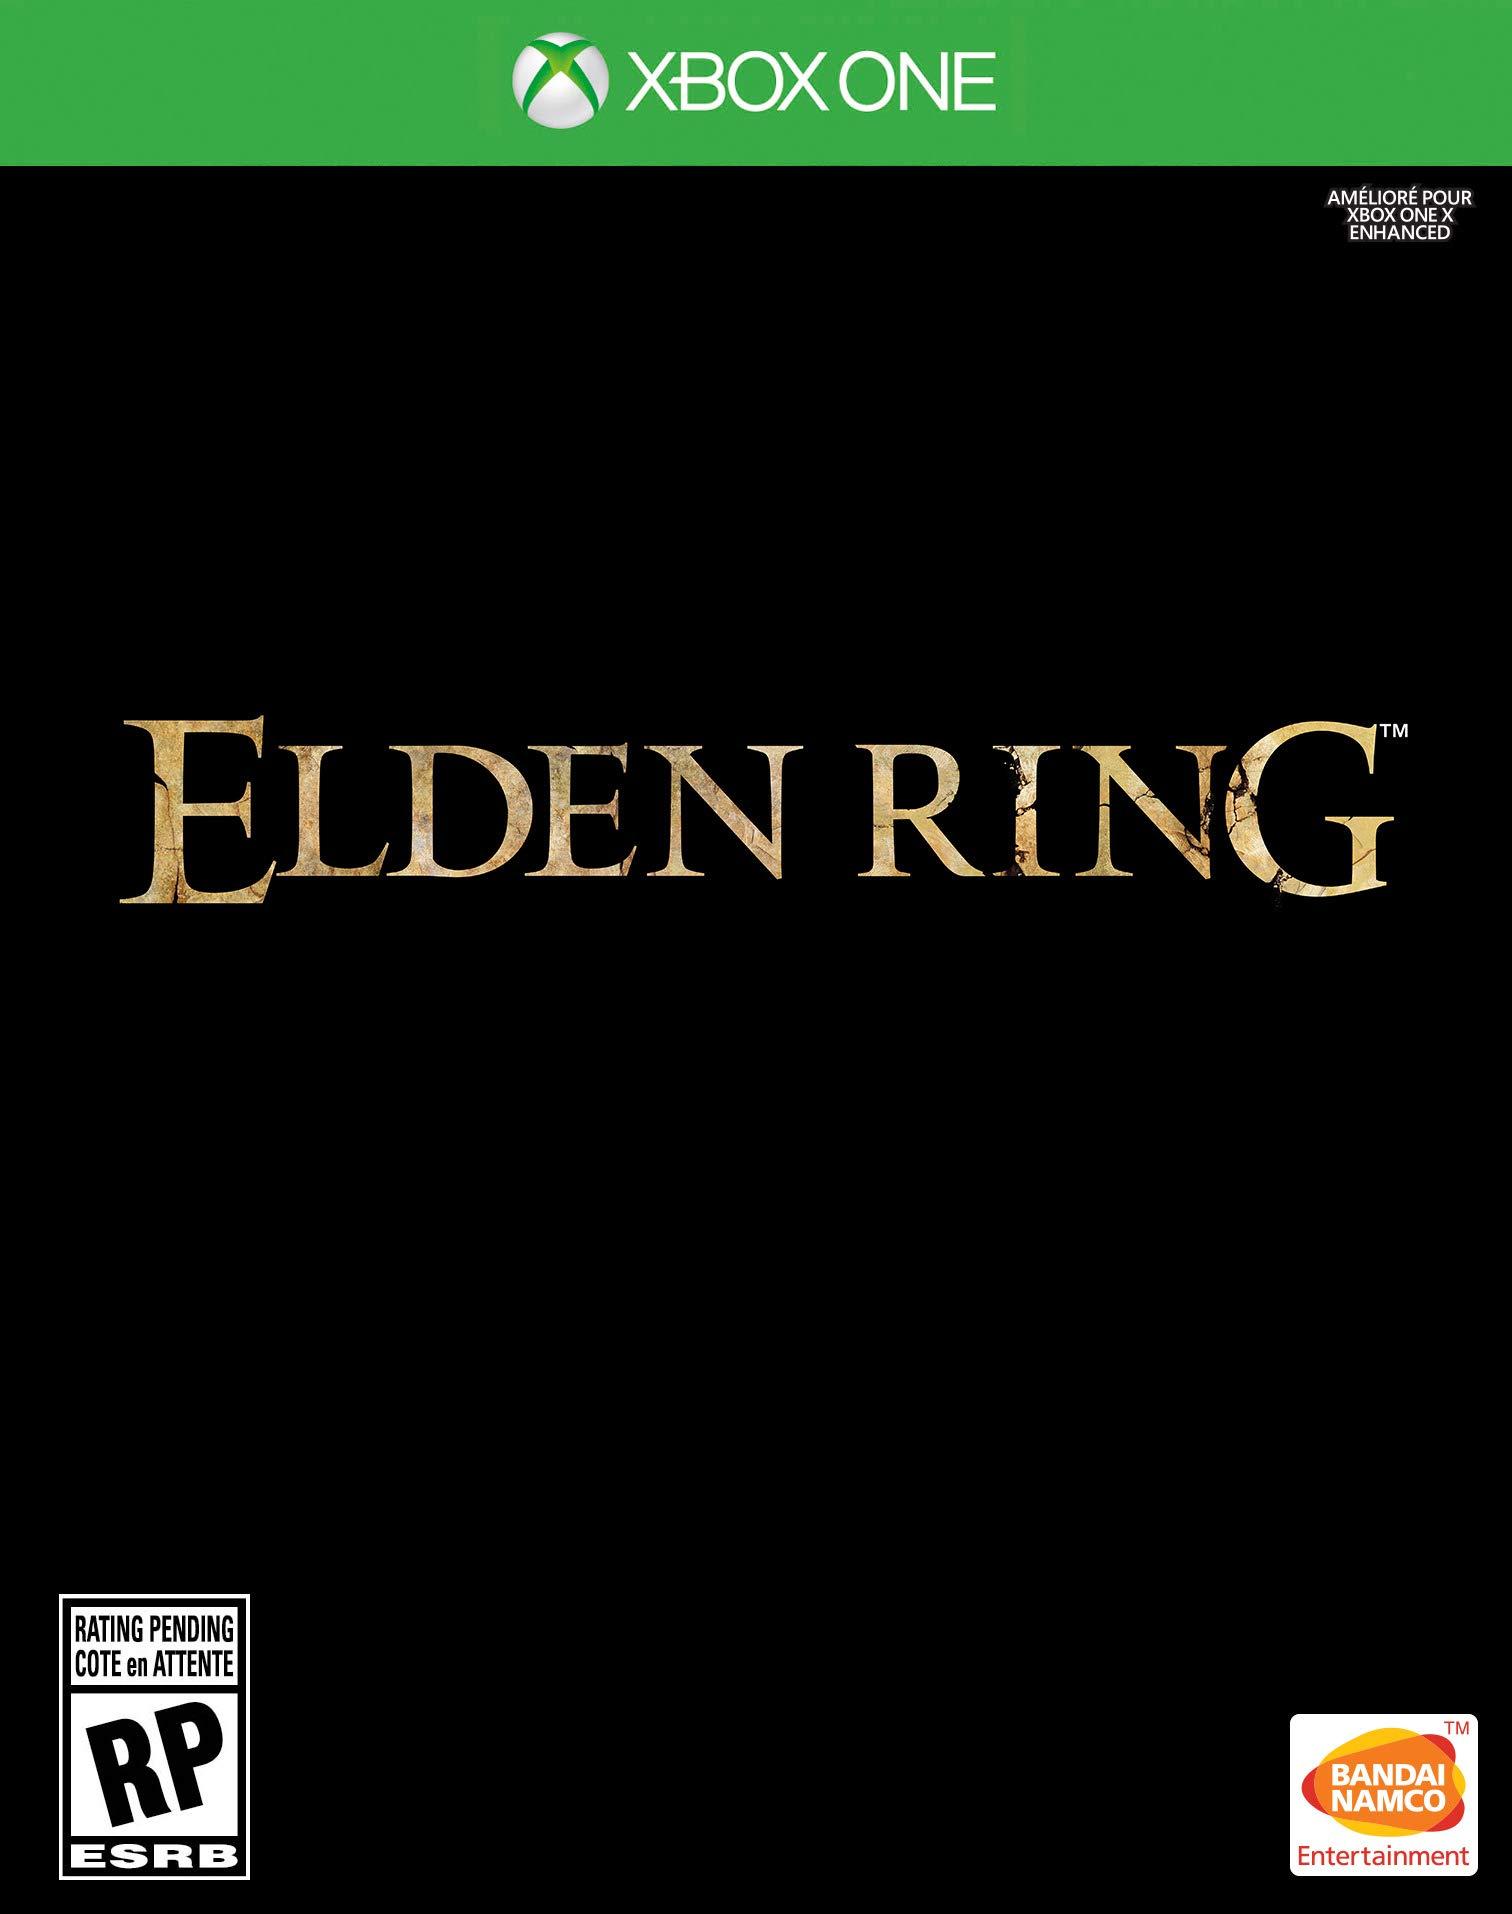 Elden Ring - Xbox One by Bandai Namco (Image #9)